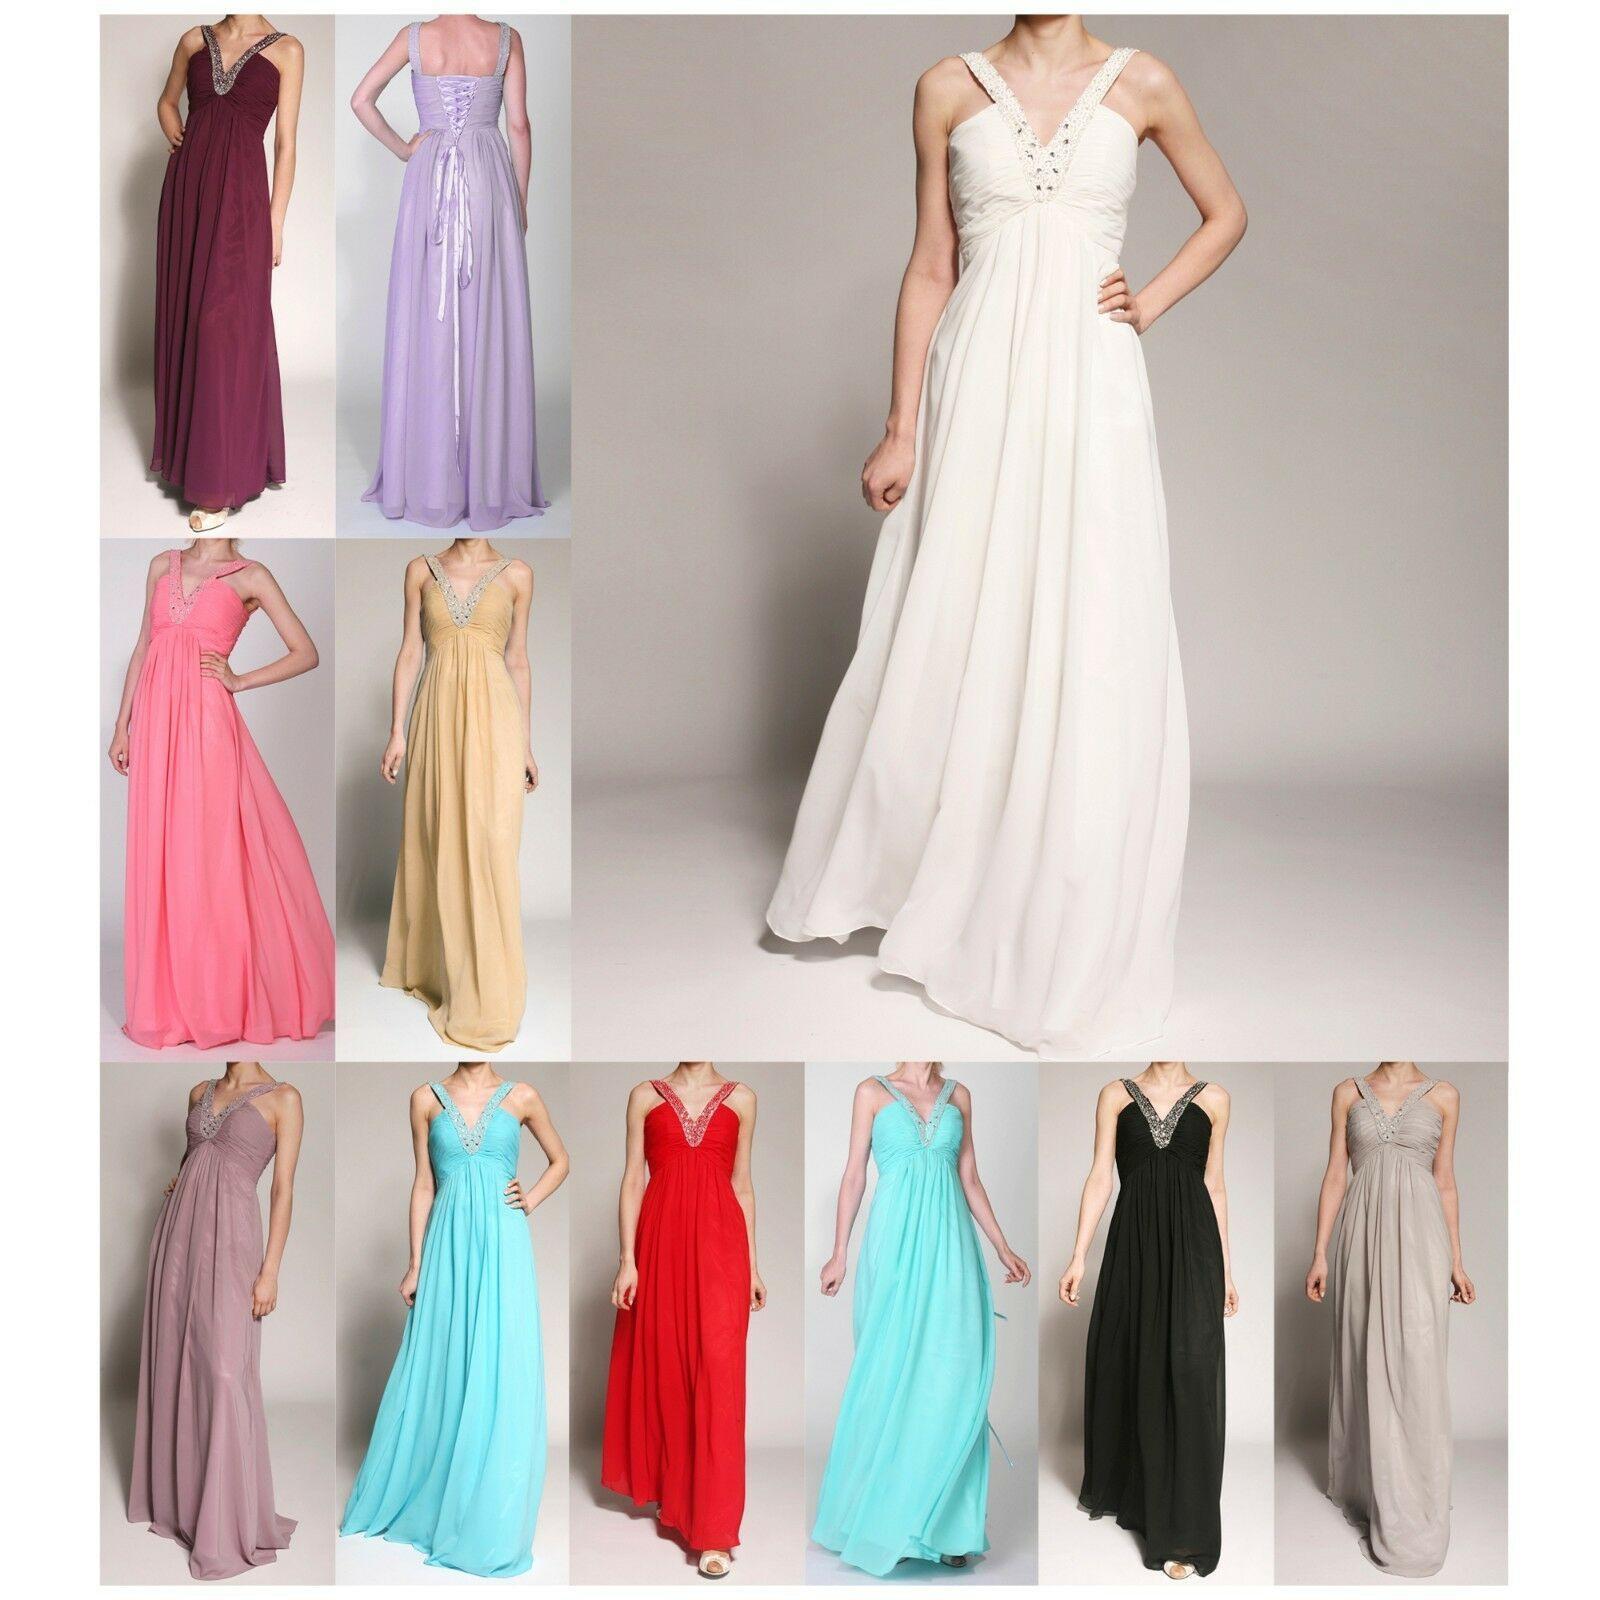 Elegant Abendkleider Curve Boutique - Abendkleid